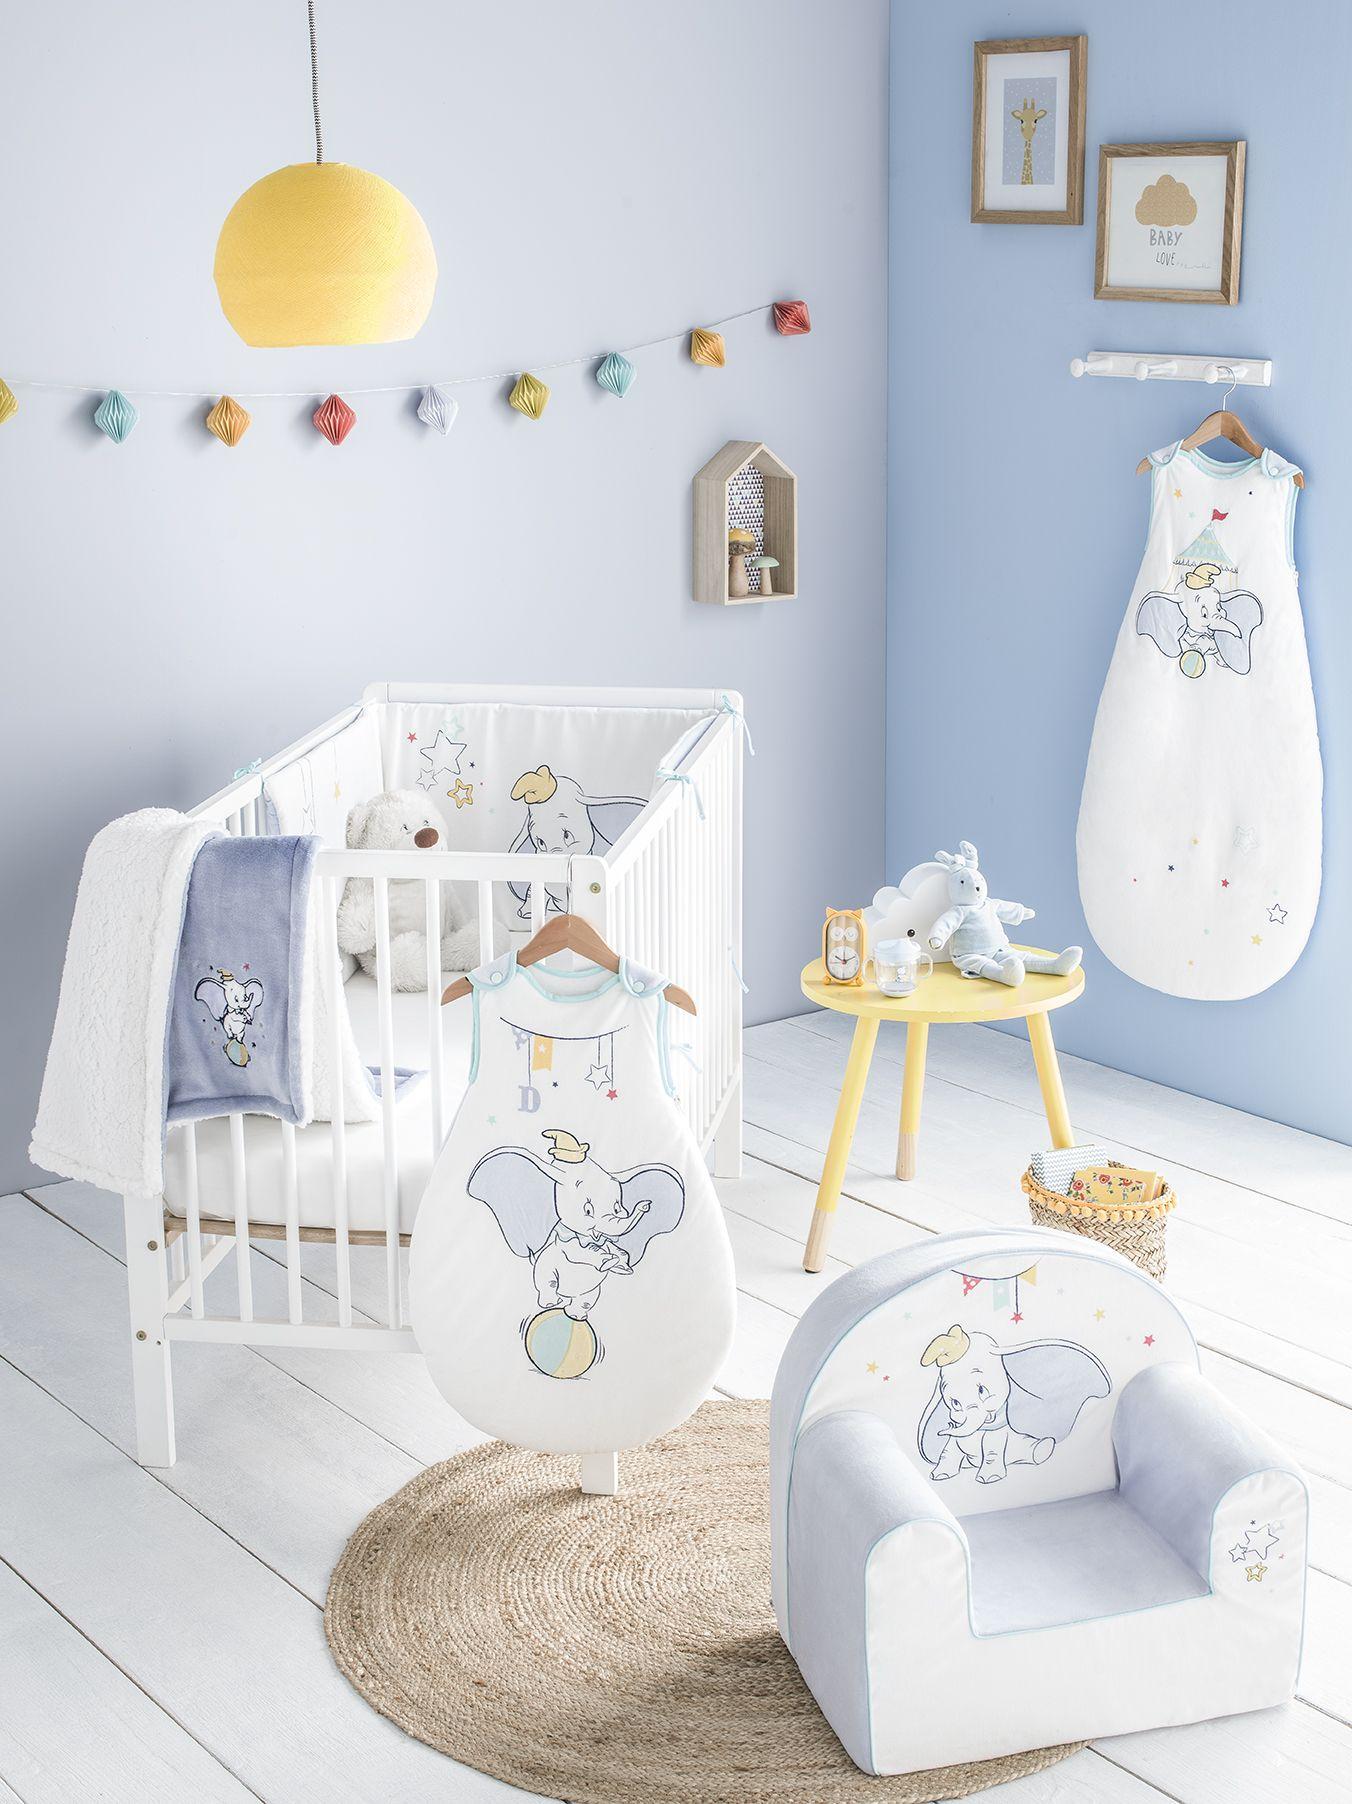 Chambre bébé Disney Dumbo  Chambre bébé disney, Chambre bébé